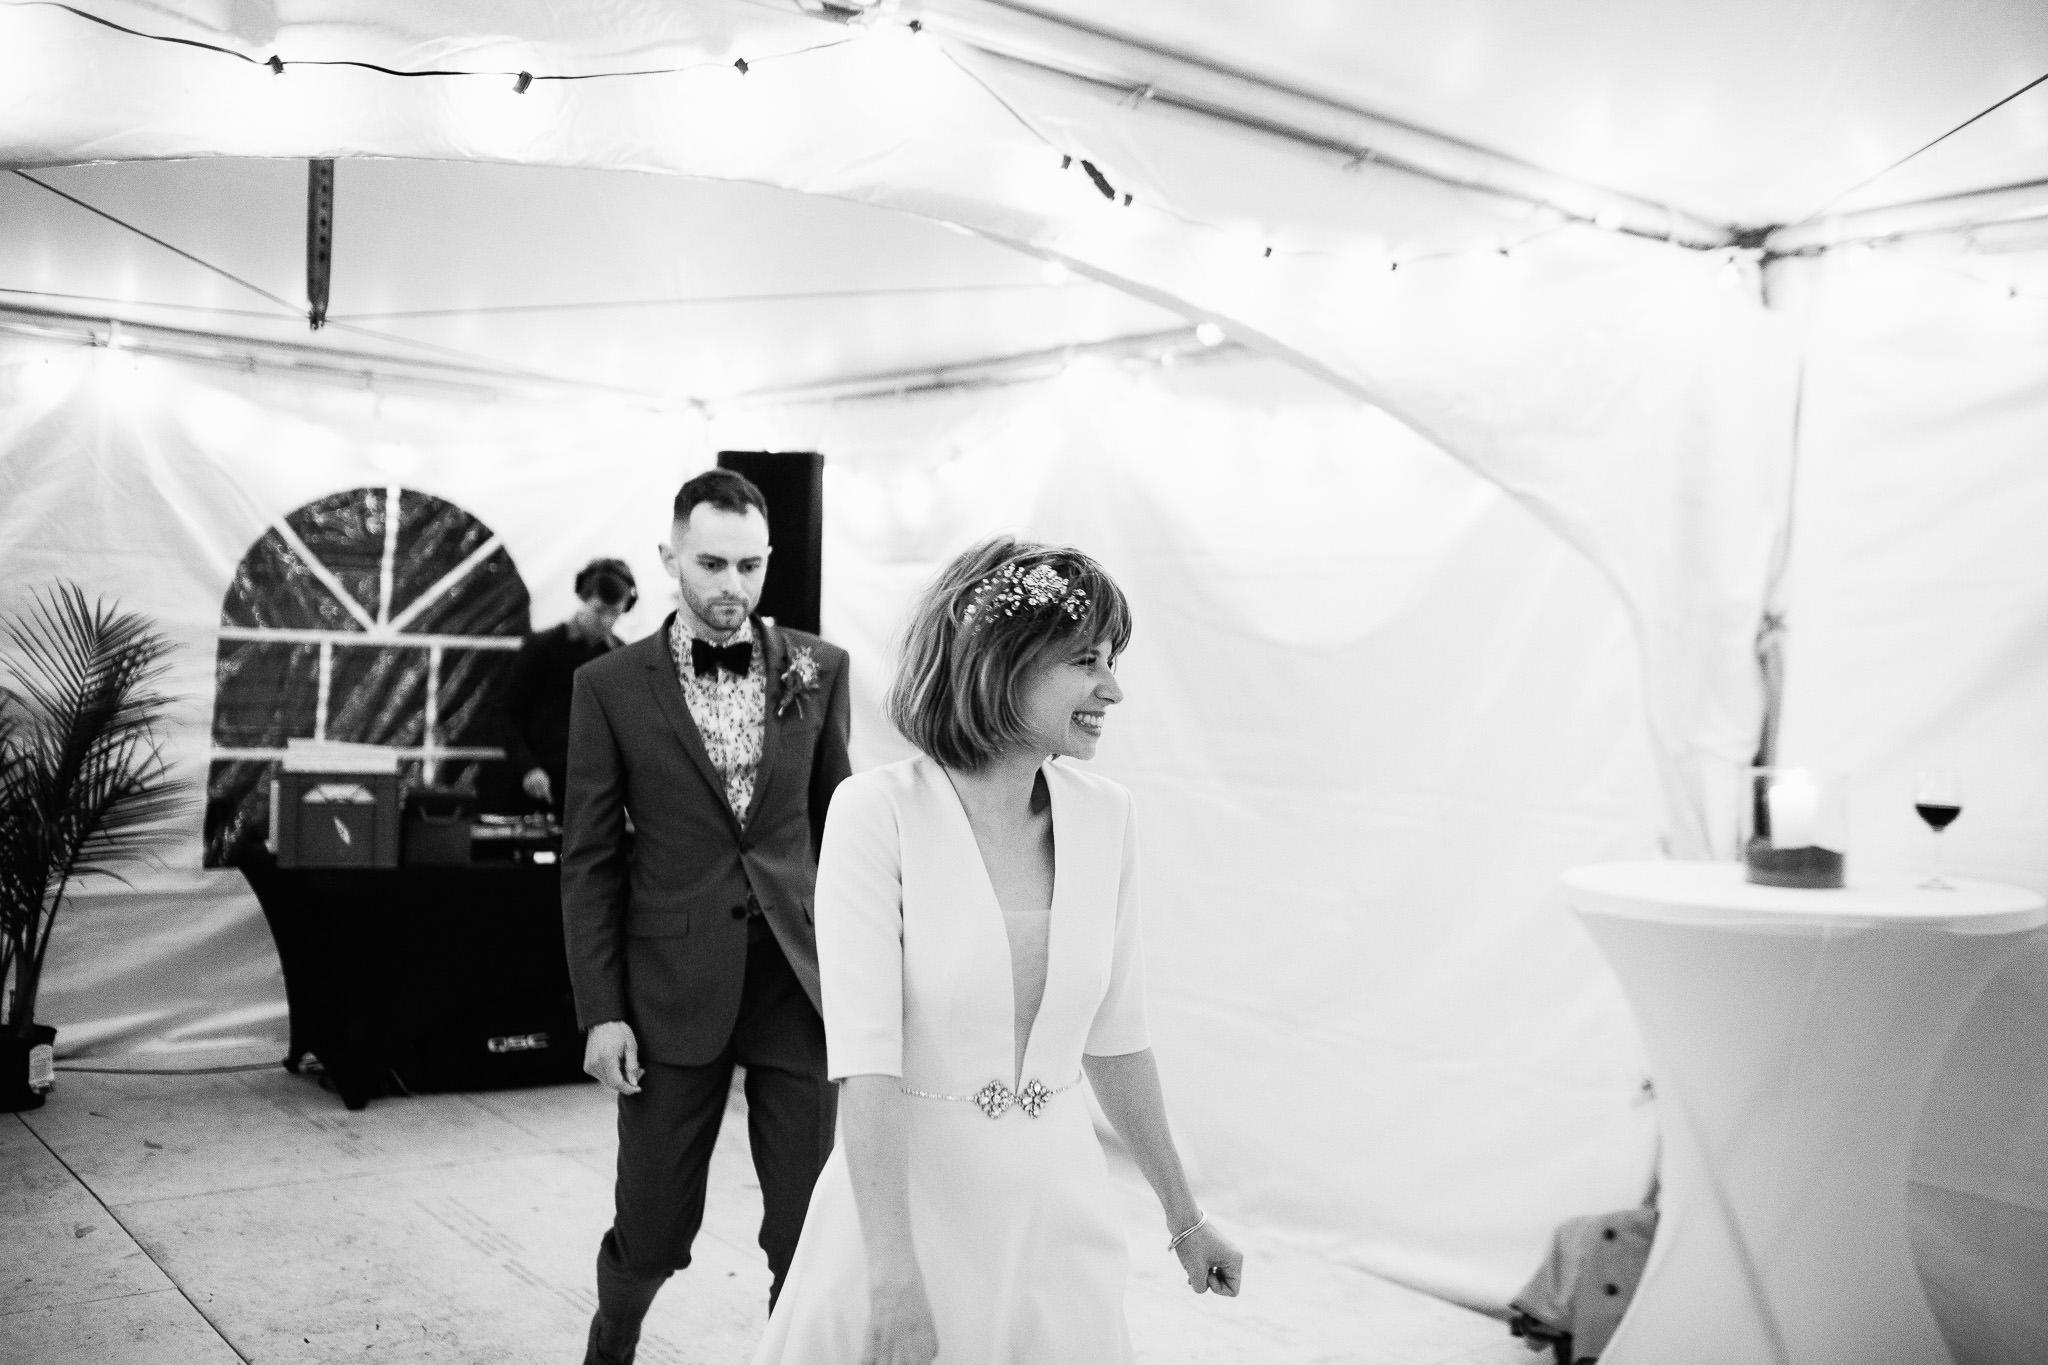 080_Canada-documentary-wedding-photograp